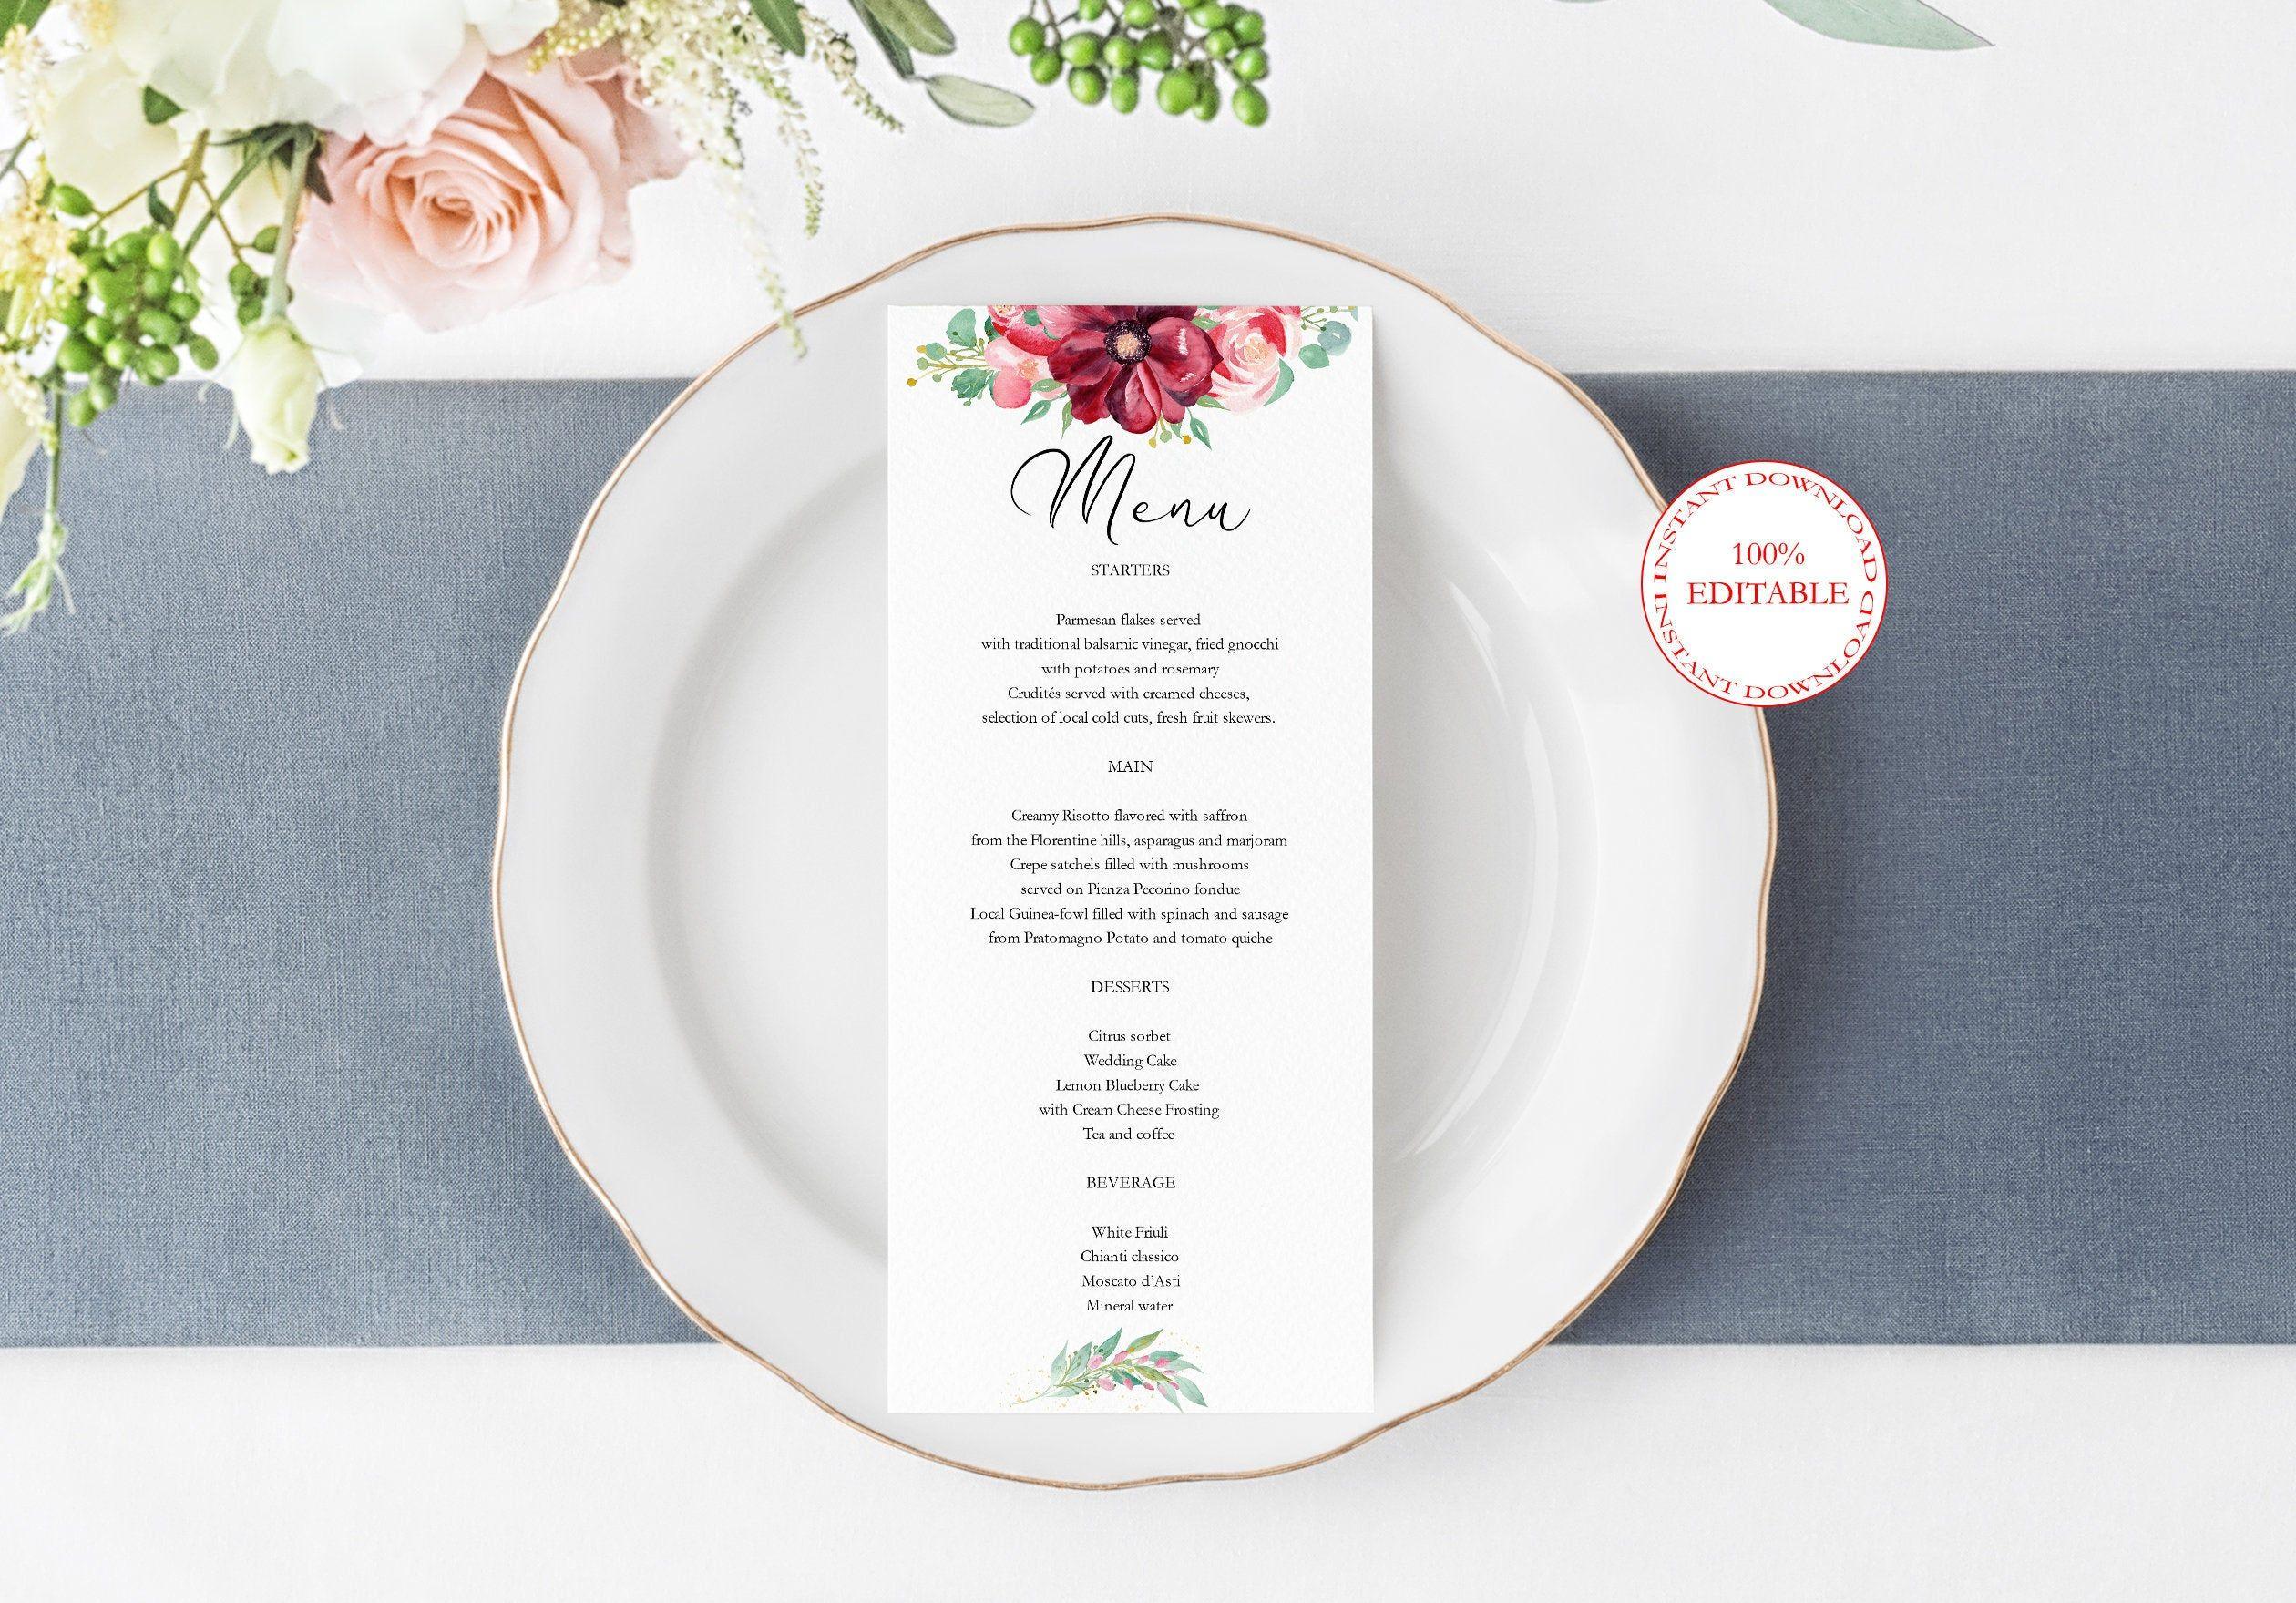 Boho Burgundy Menu Card Template Floral Wedding Custom Menu Etsy Menu Card Template Menu Cards Wedding Menu Cards